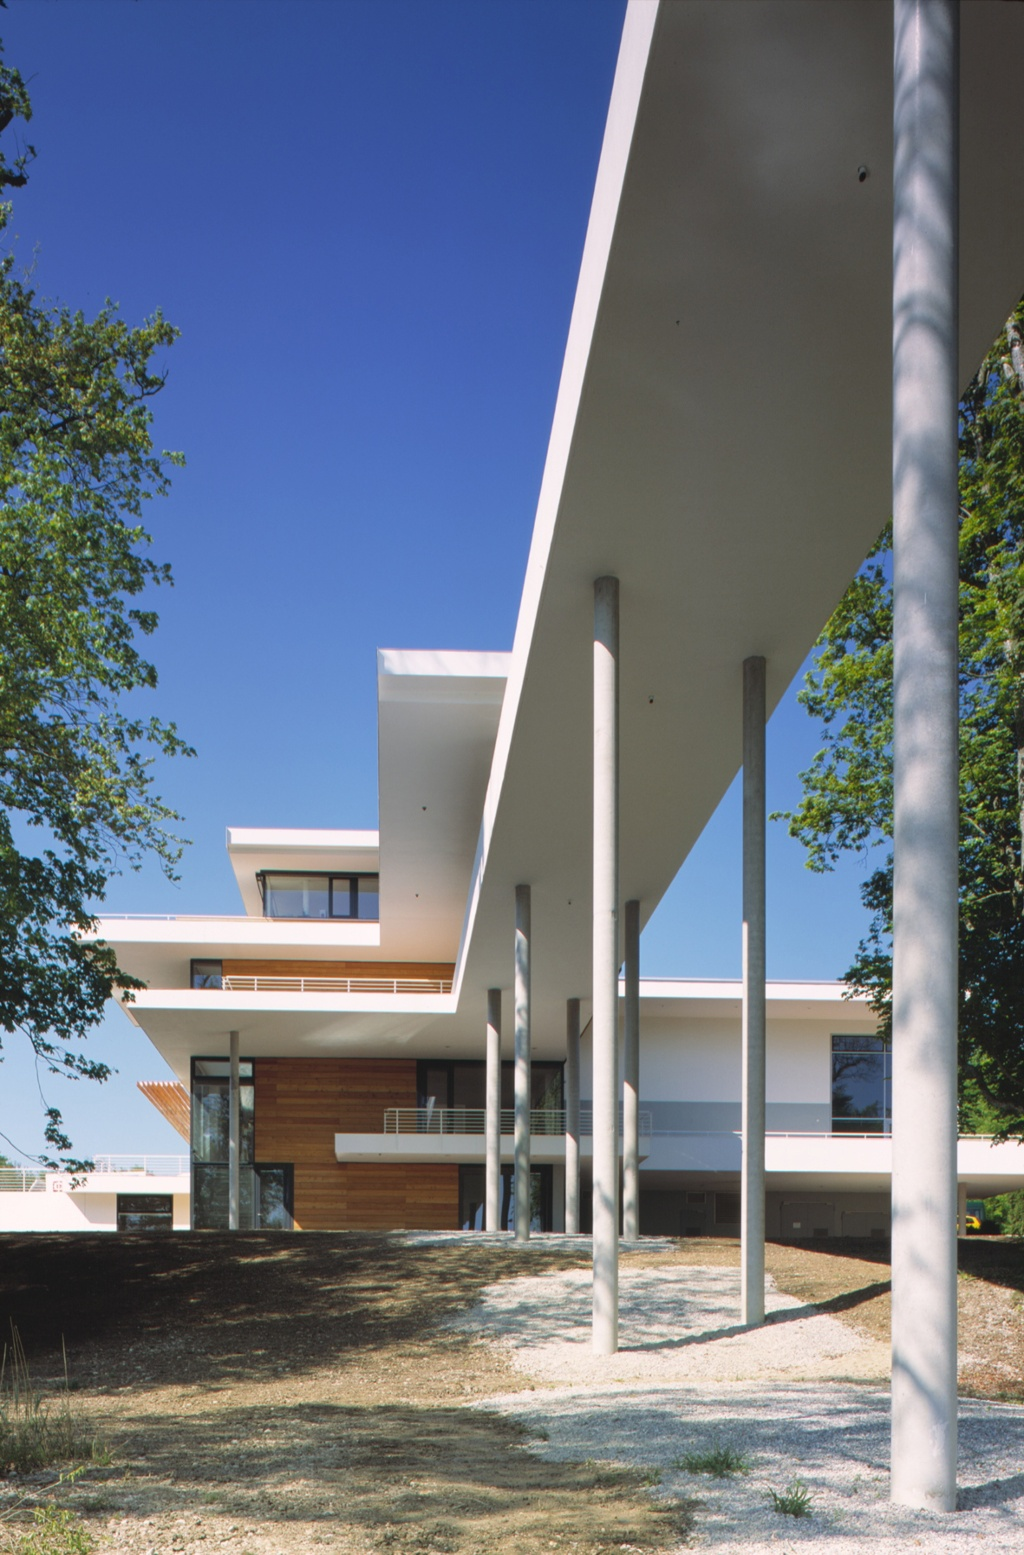 Buchheim Museum der Phantasie in Bernried am Starnberger See (Müller-Naumann)